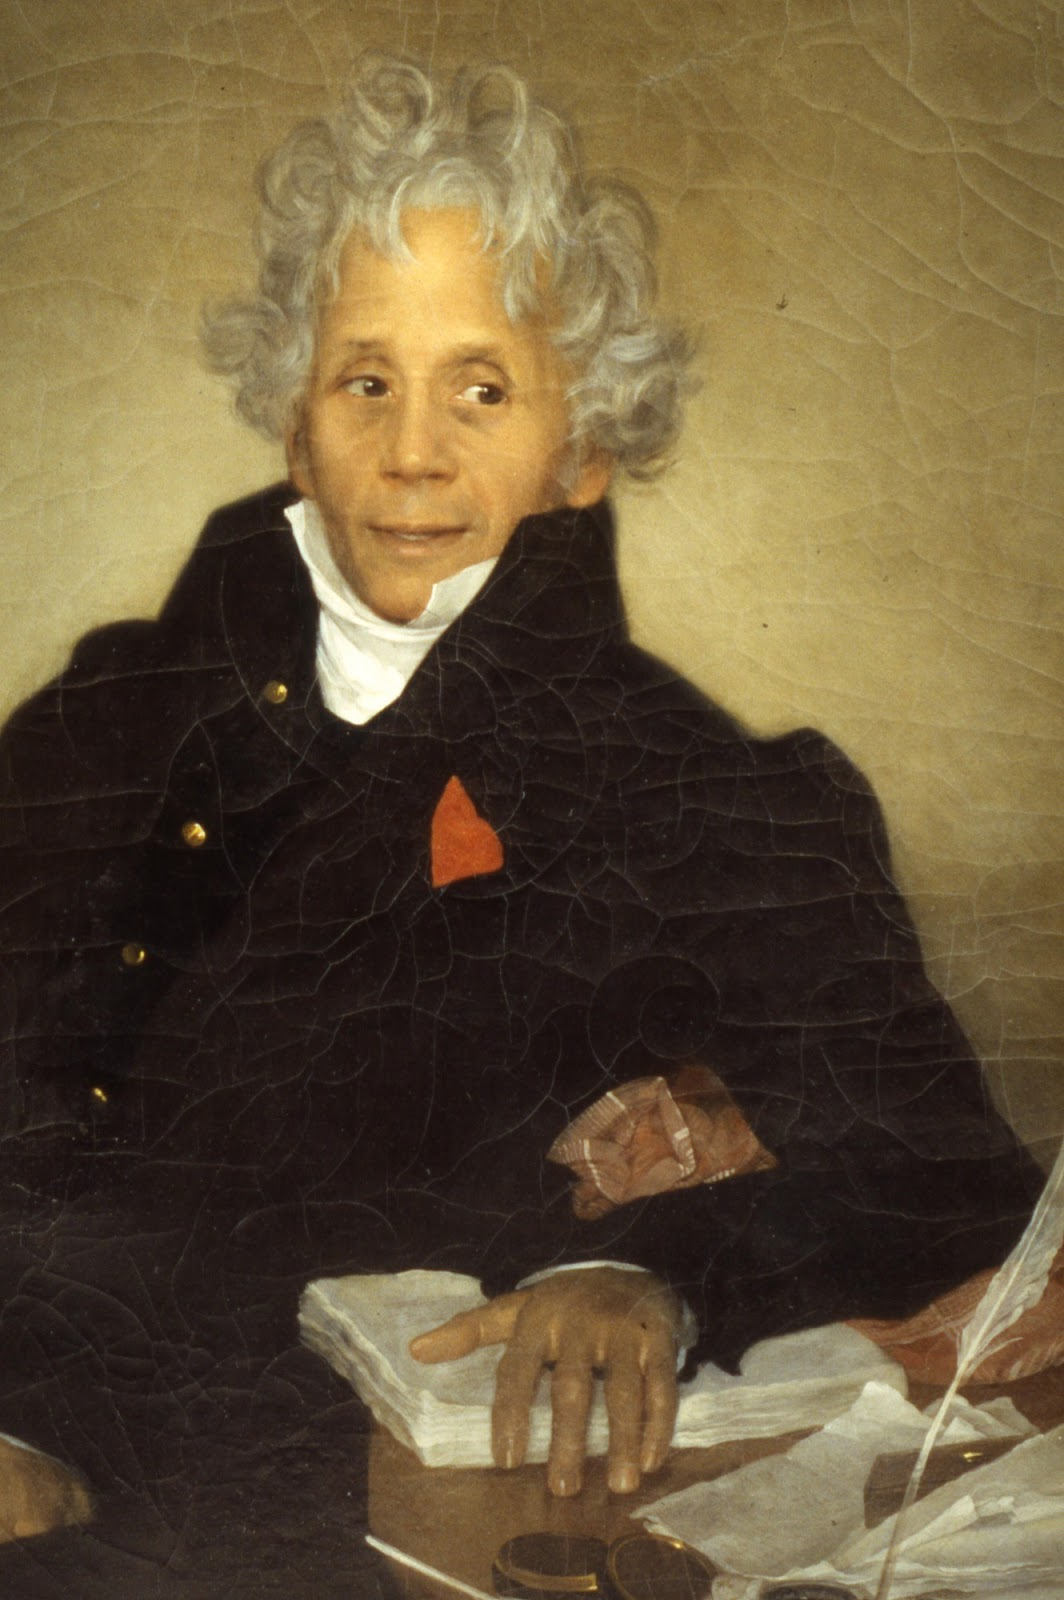 Frederick Douglass, Haiti, and Diplomacy  Fran%C3%A7ois_Fournier_de_Pescay